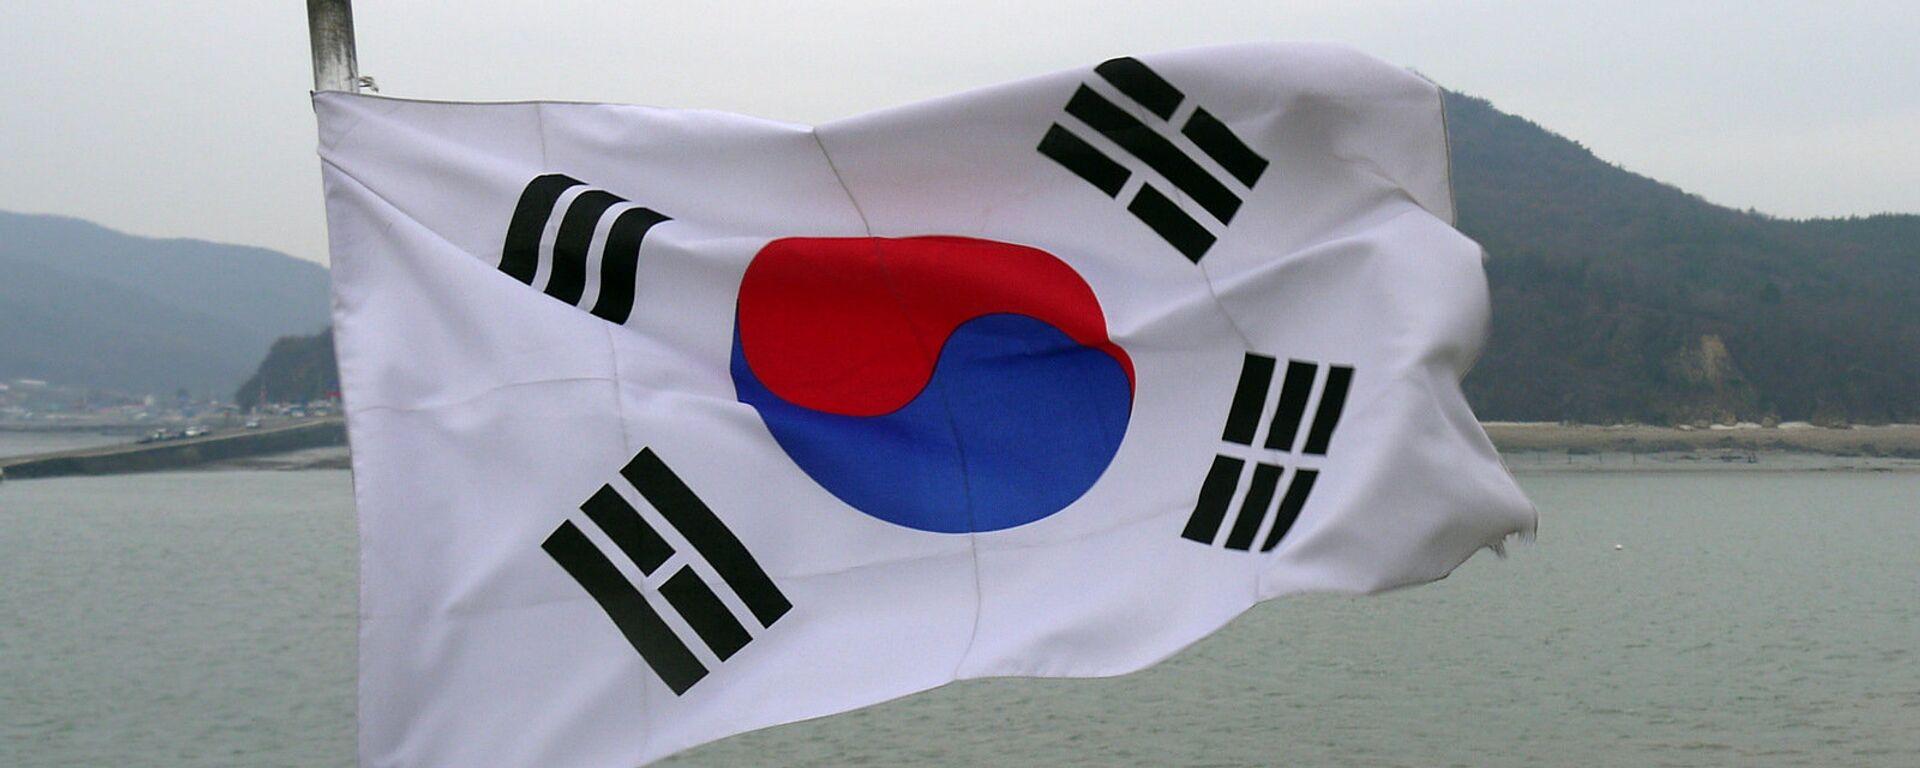 La bandera de Corea del Sur - Sputnik Mundo, 1920, 07.09.2021